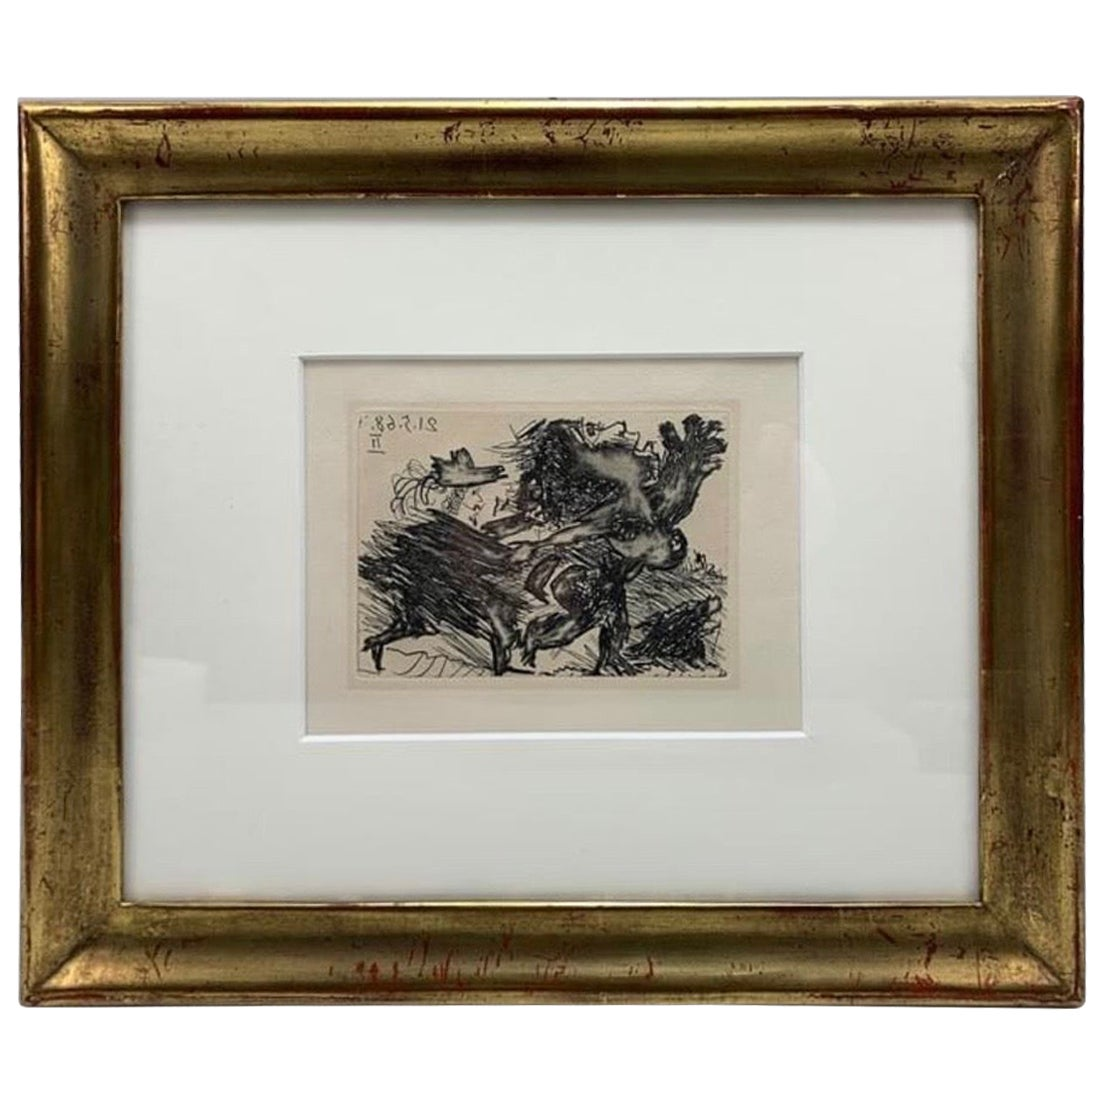 "Original Etching by Pablo Picasso ""La Celestine"", 1968"